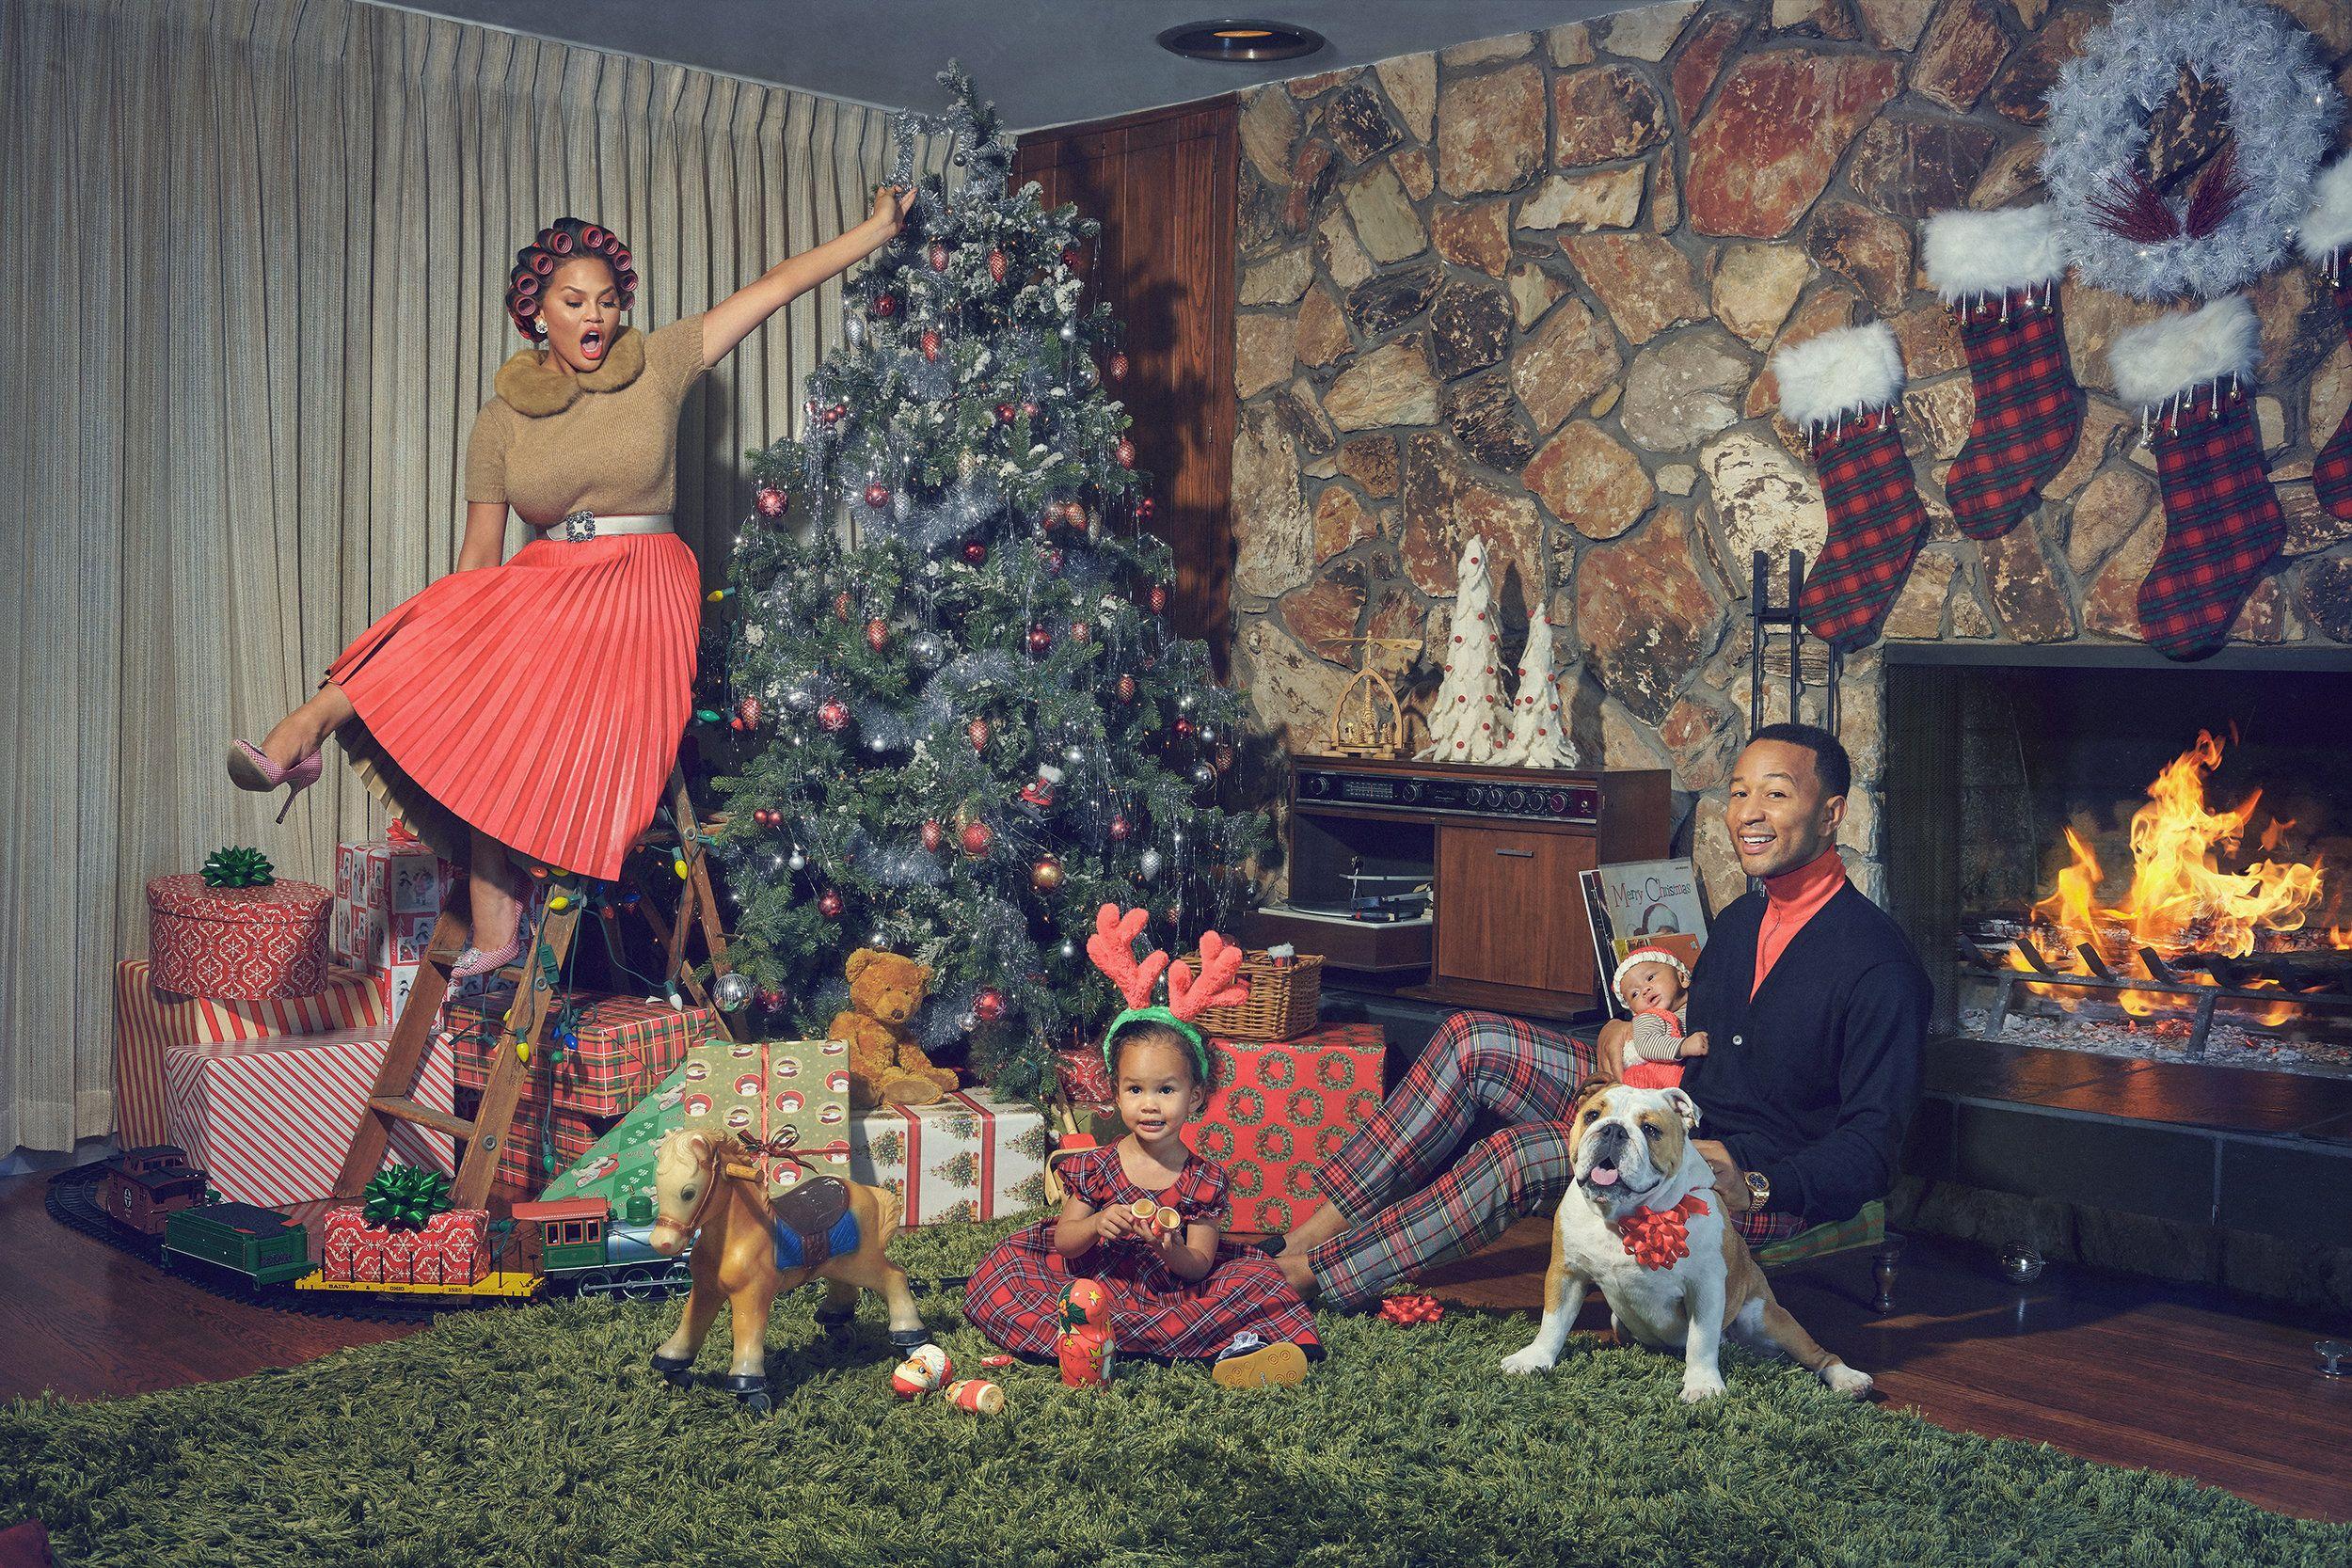 Pin By Linda Hopkins On Chrissy Teigen Style Merry Christmas Baby Christmas Albums John Legend